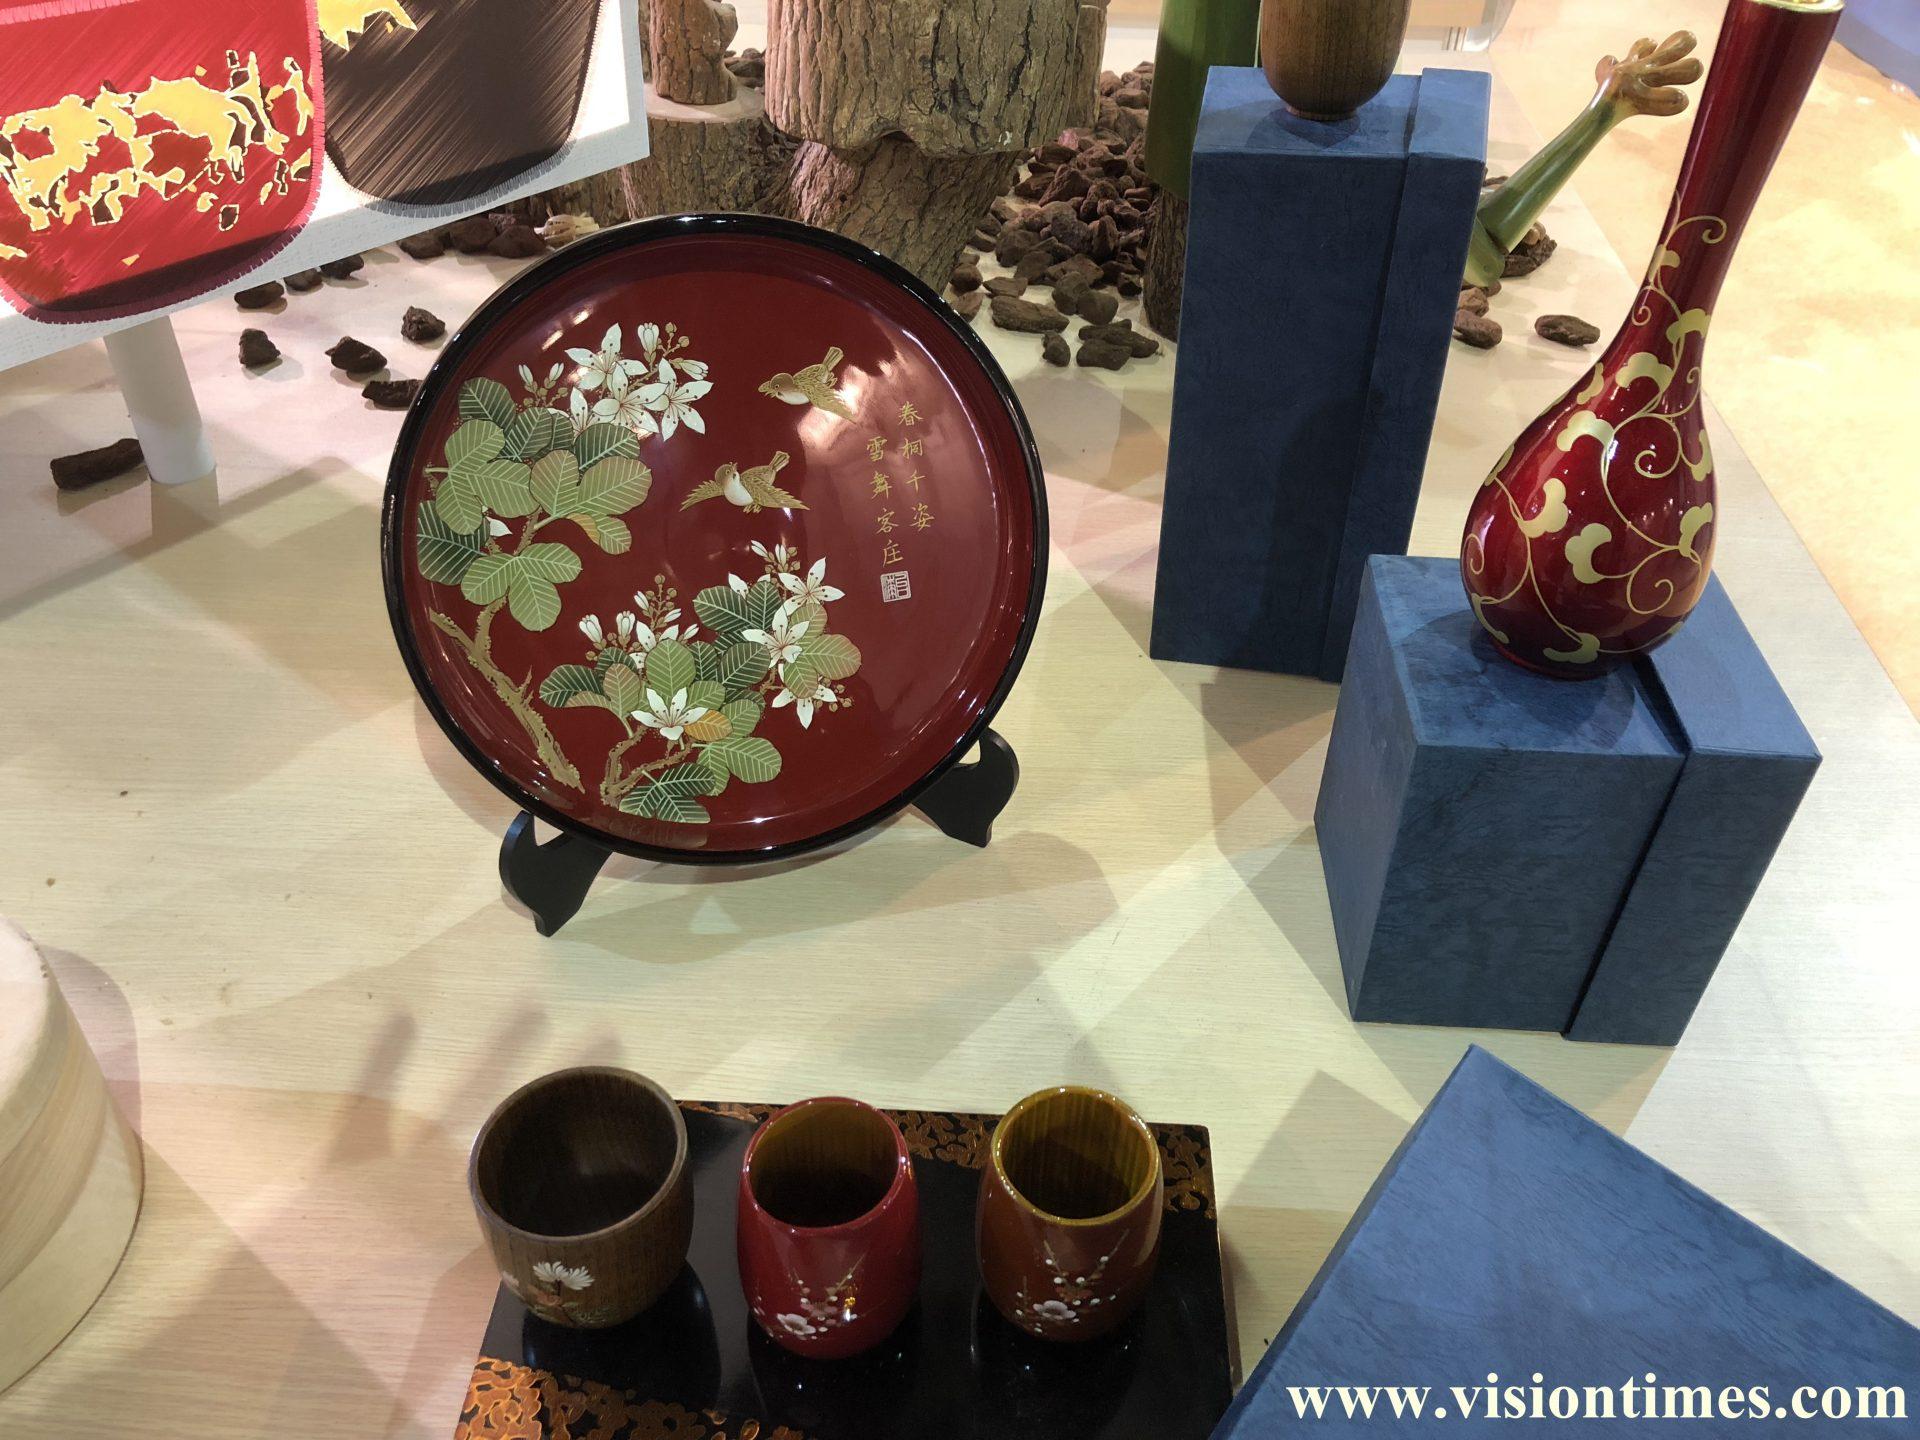 The lacquerware displayed at the 2017 Hakka Expo (Image: Julia Fu / Vision Times)